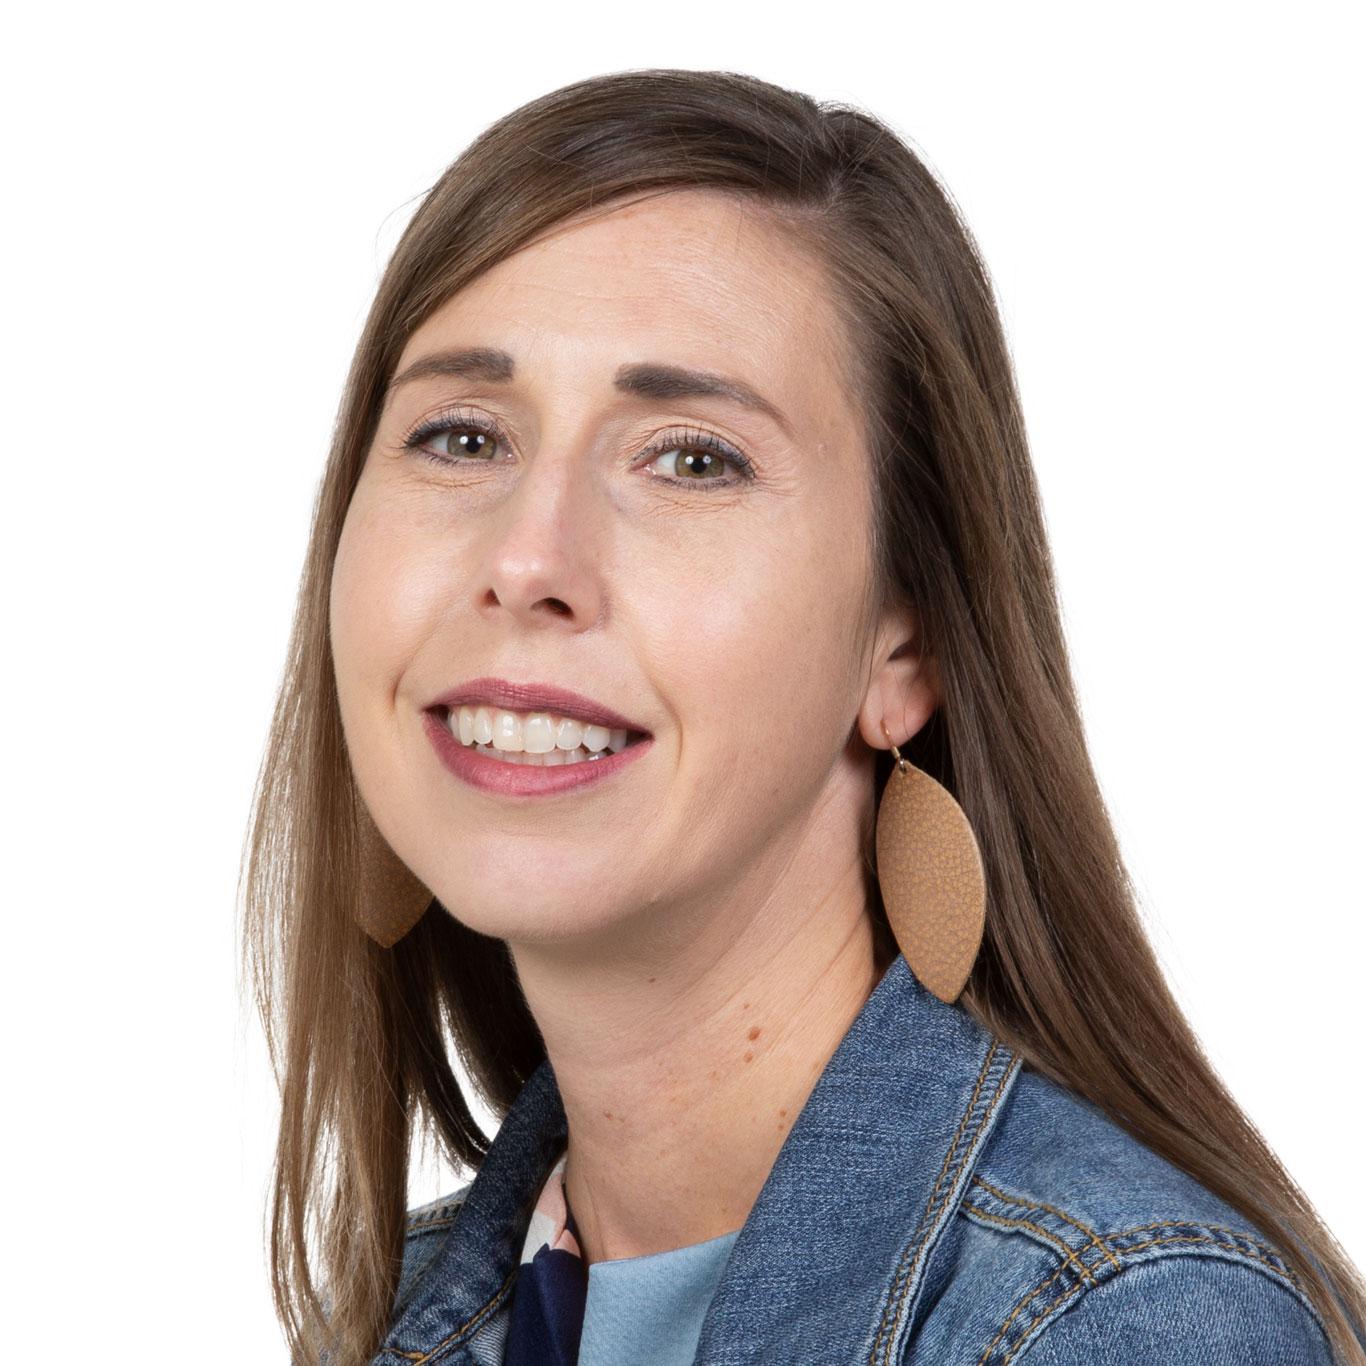 Lacey O'Brien